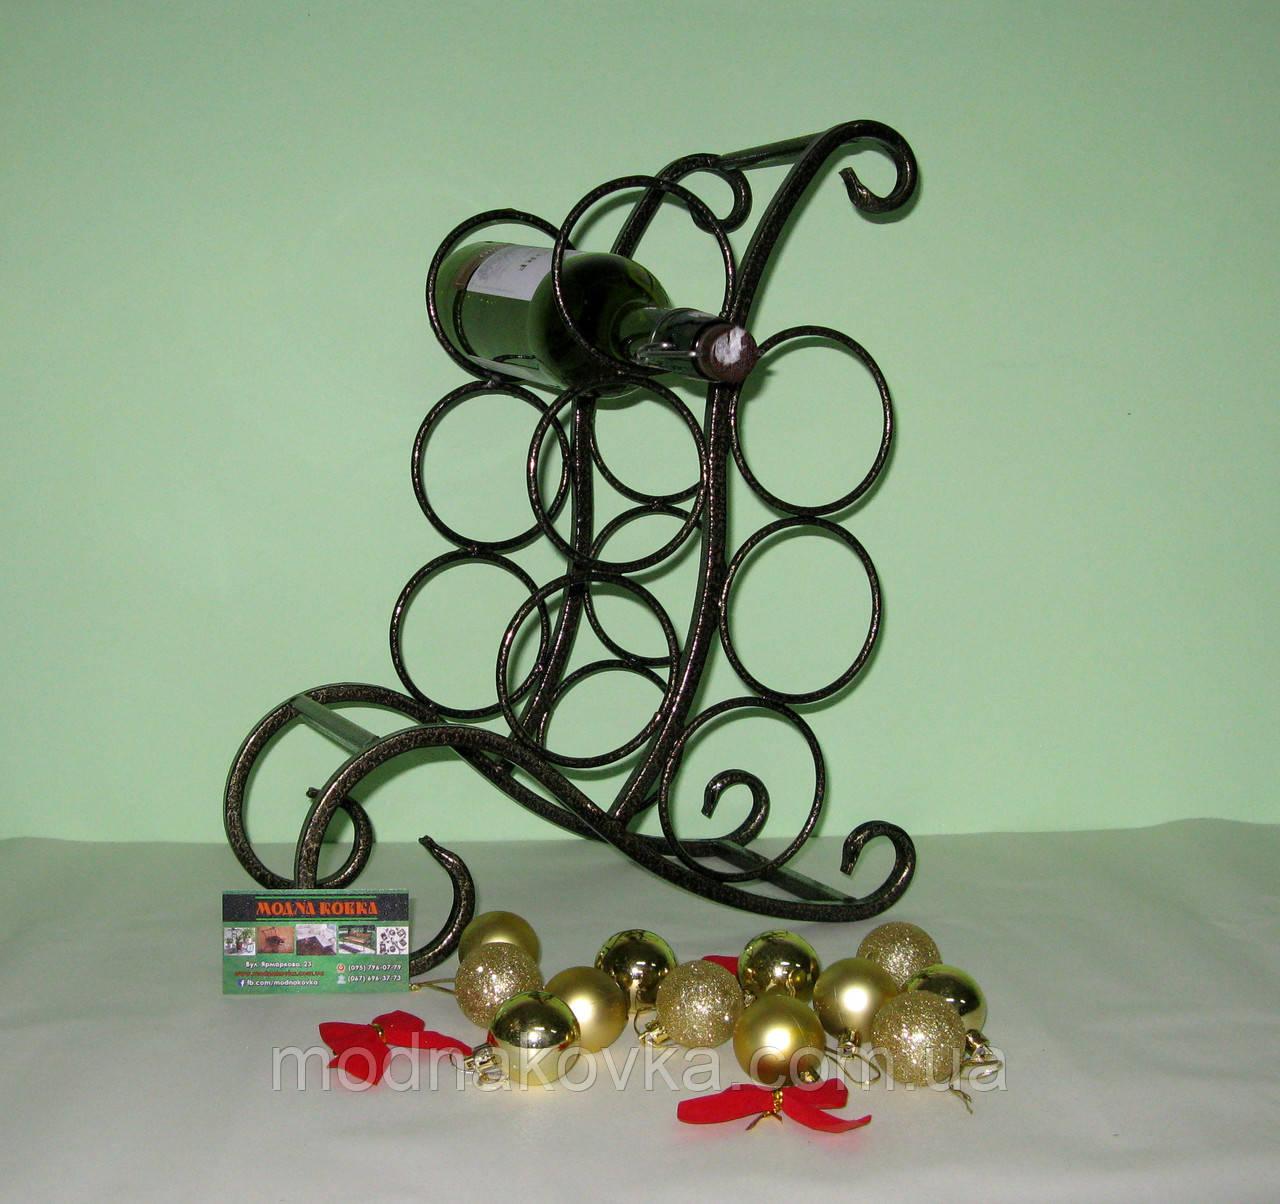 Мини-бар 602 (подставка под бутылку), черная/золото